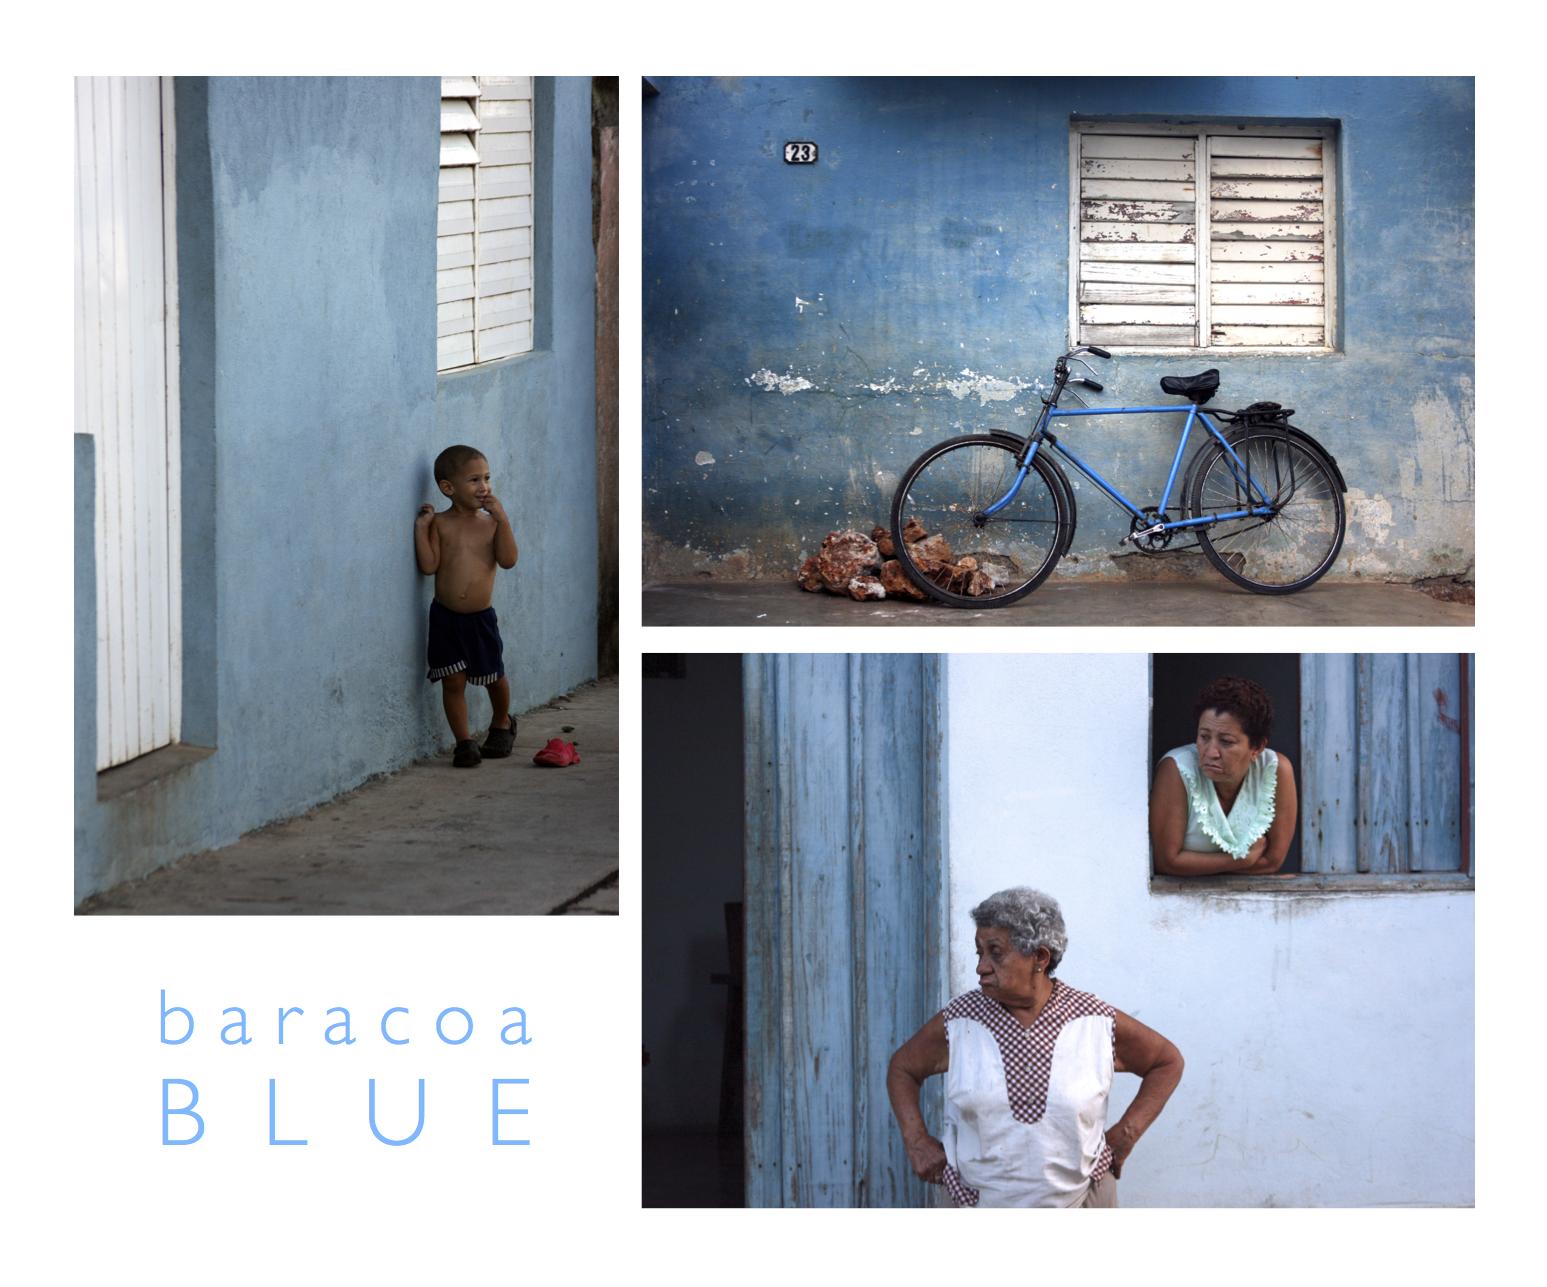 1 baracoa Fotos